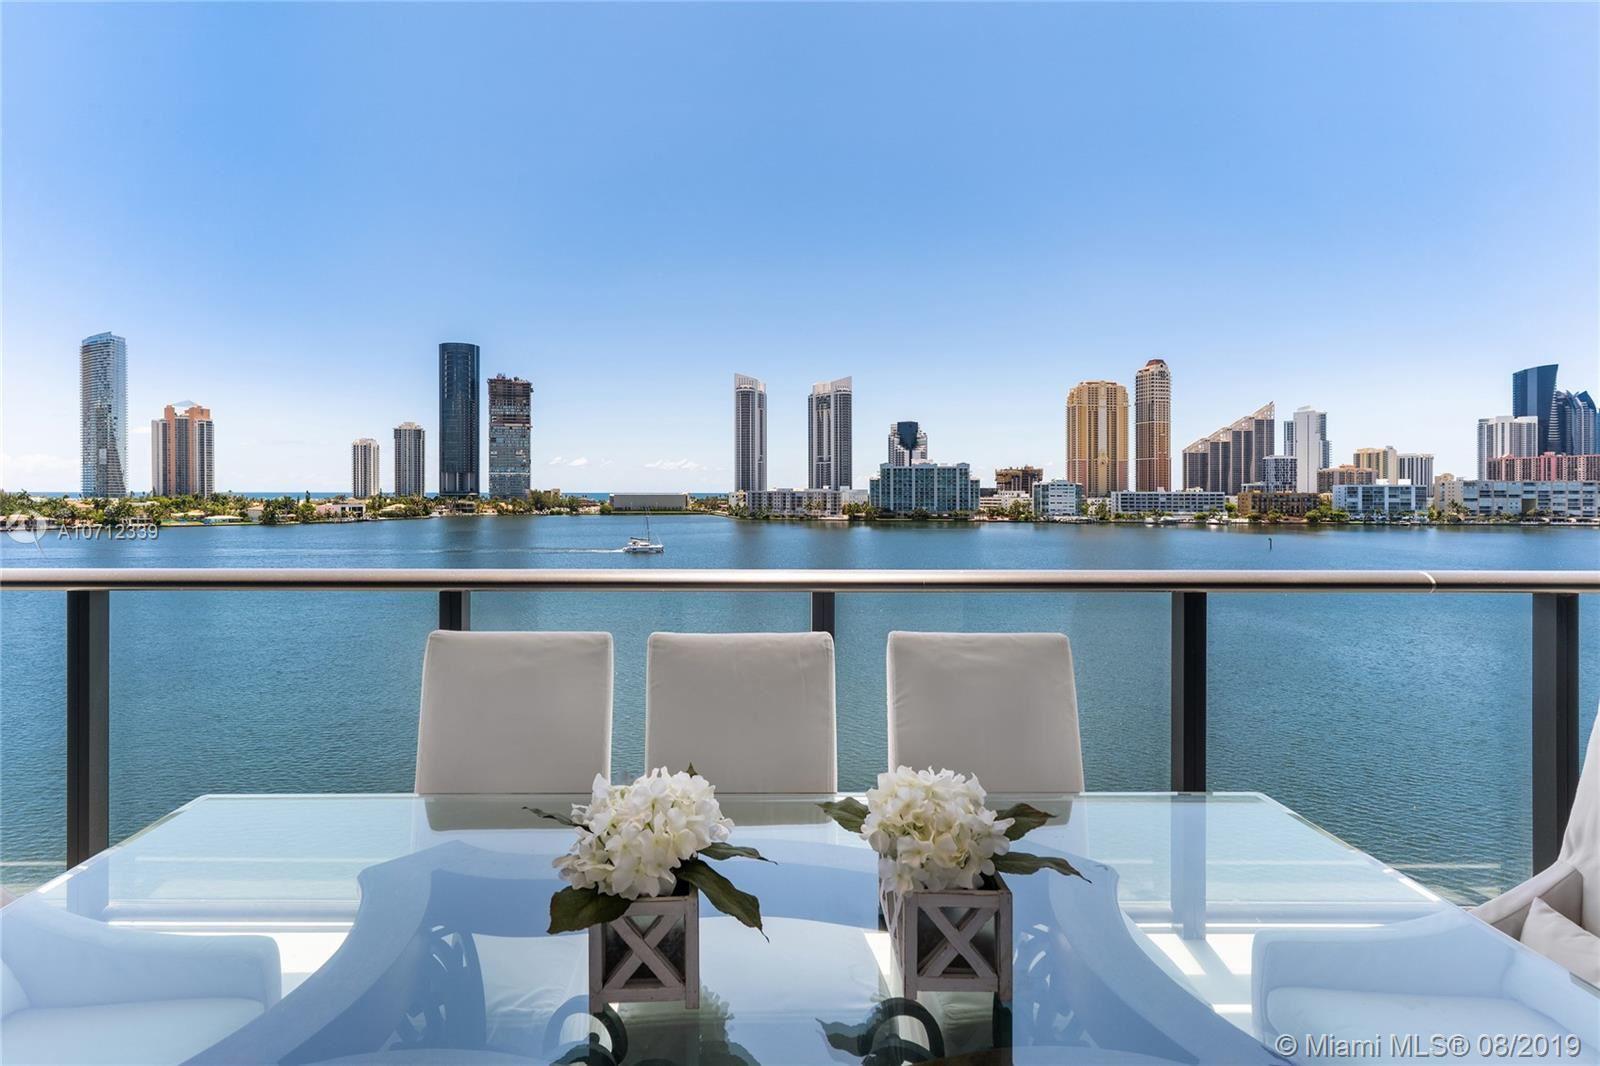 5000 Island Estates Dr #508, Aventura, FL 33180 - #: A10712339